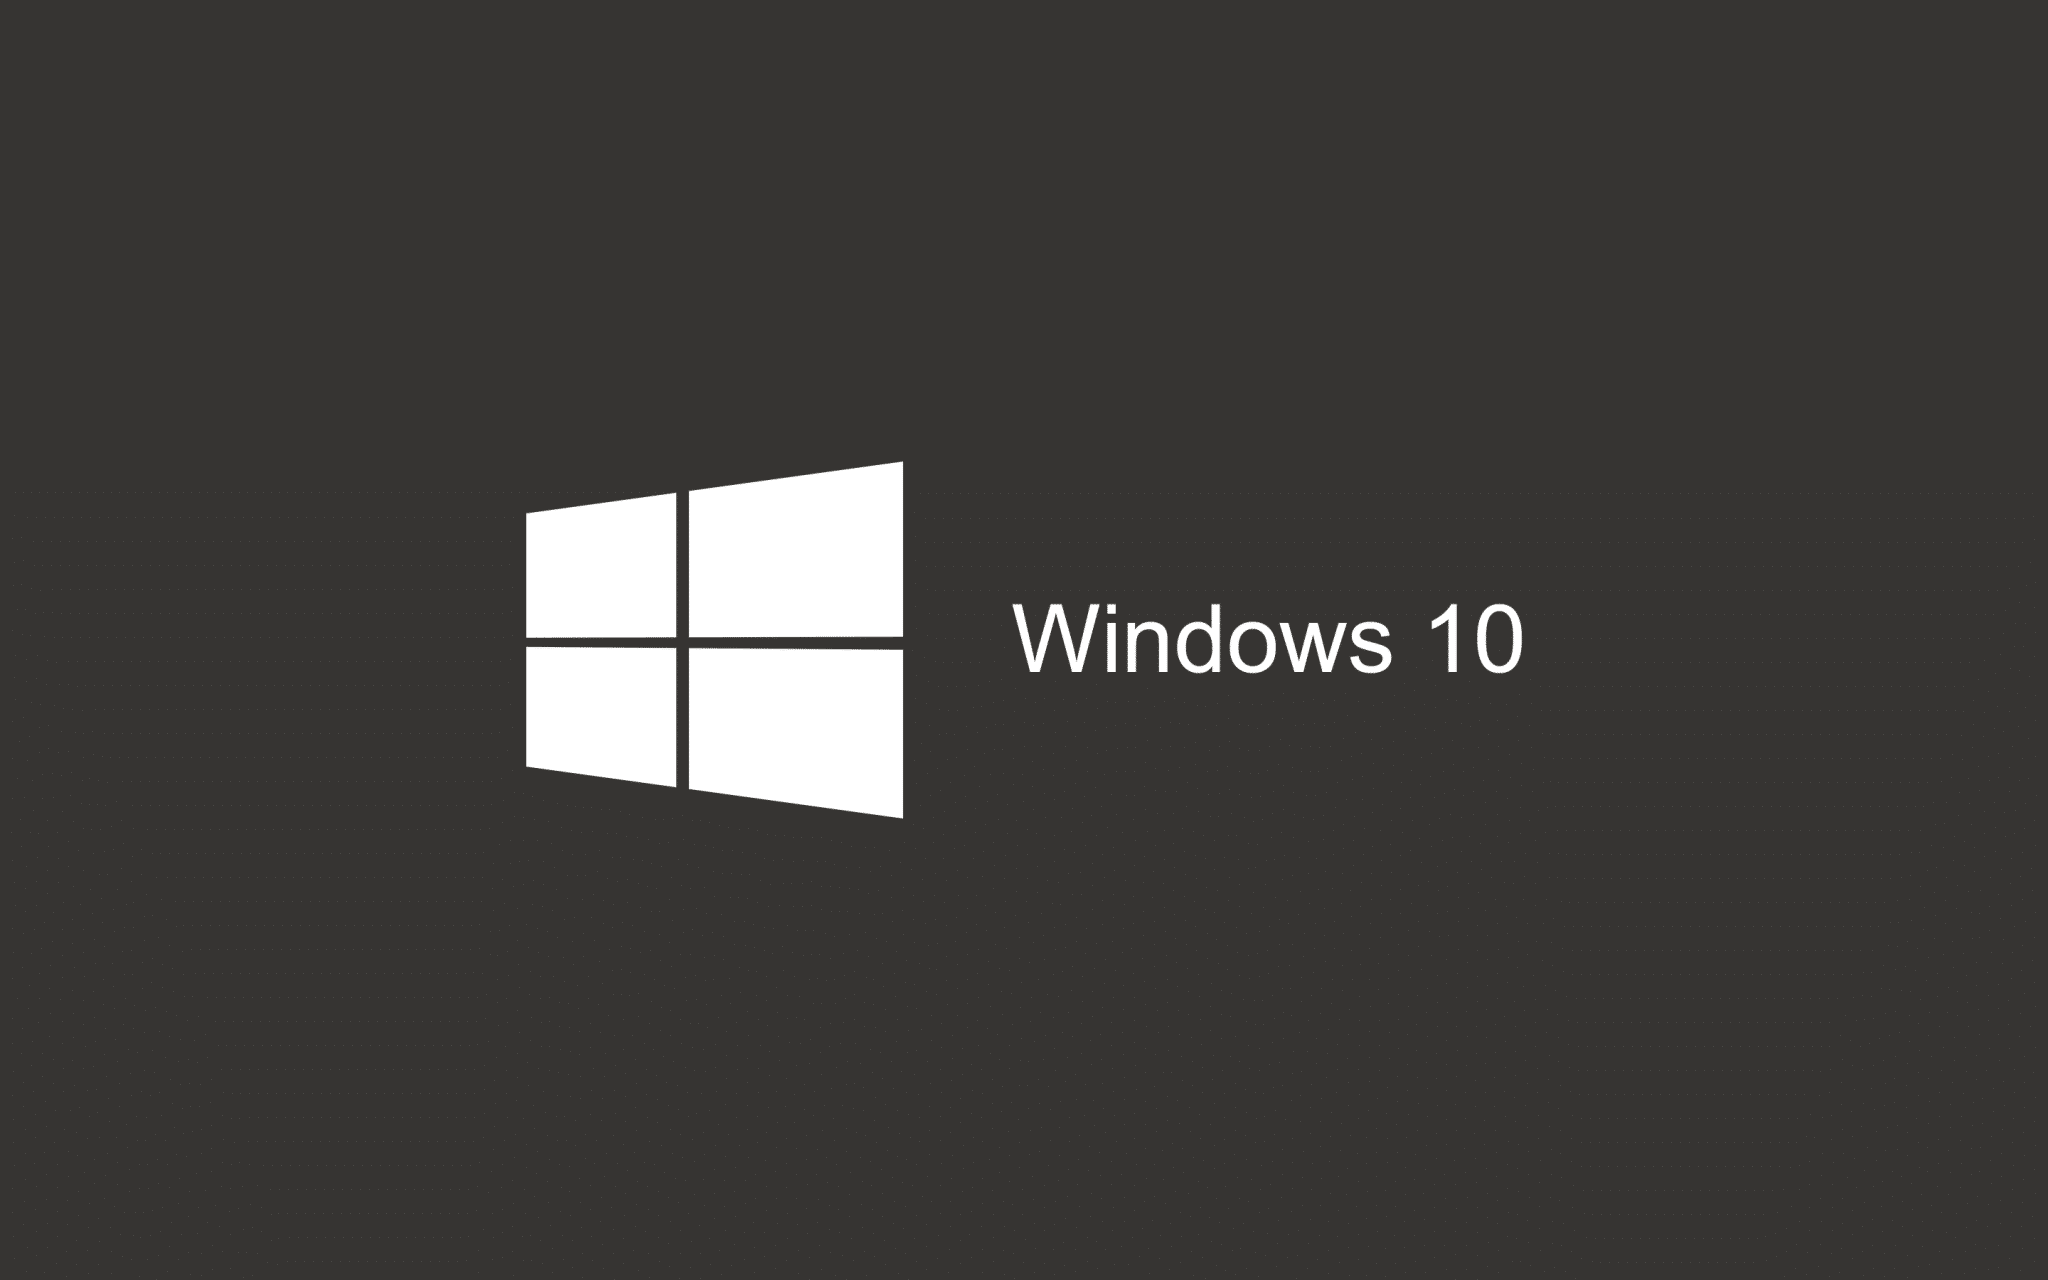 Gray Wallpaper Windows 10 HD 2880x1800